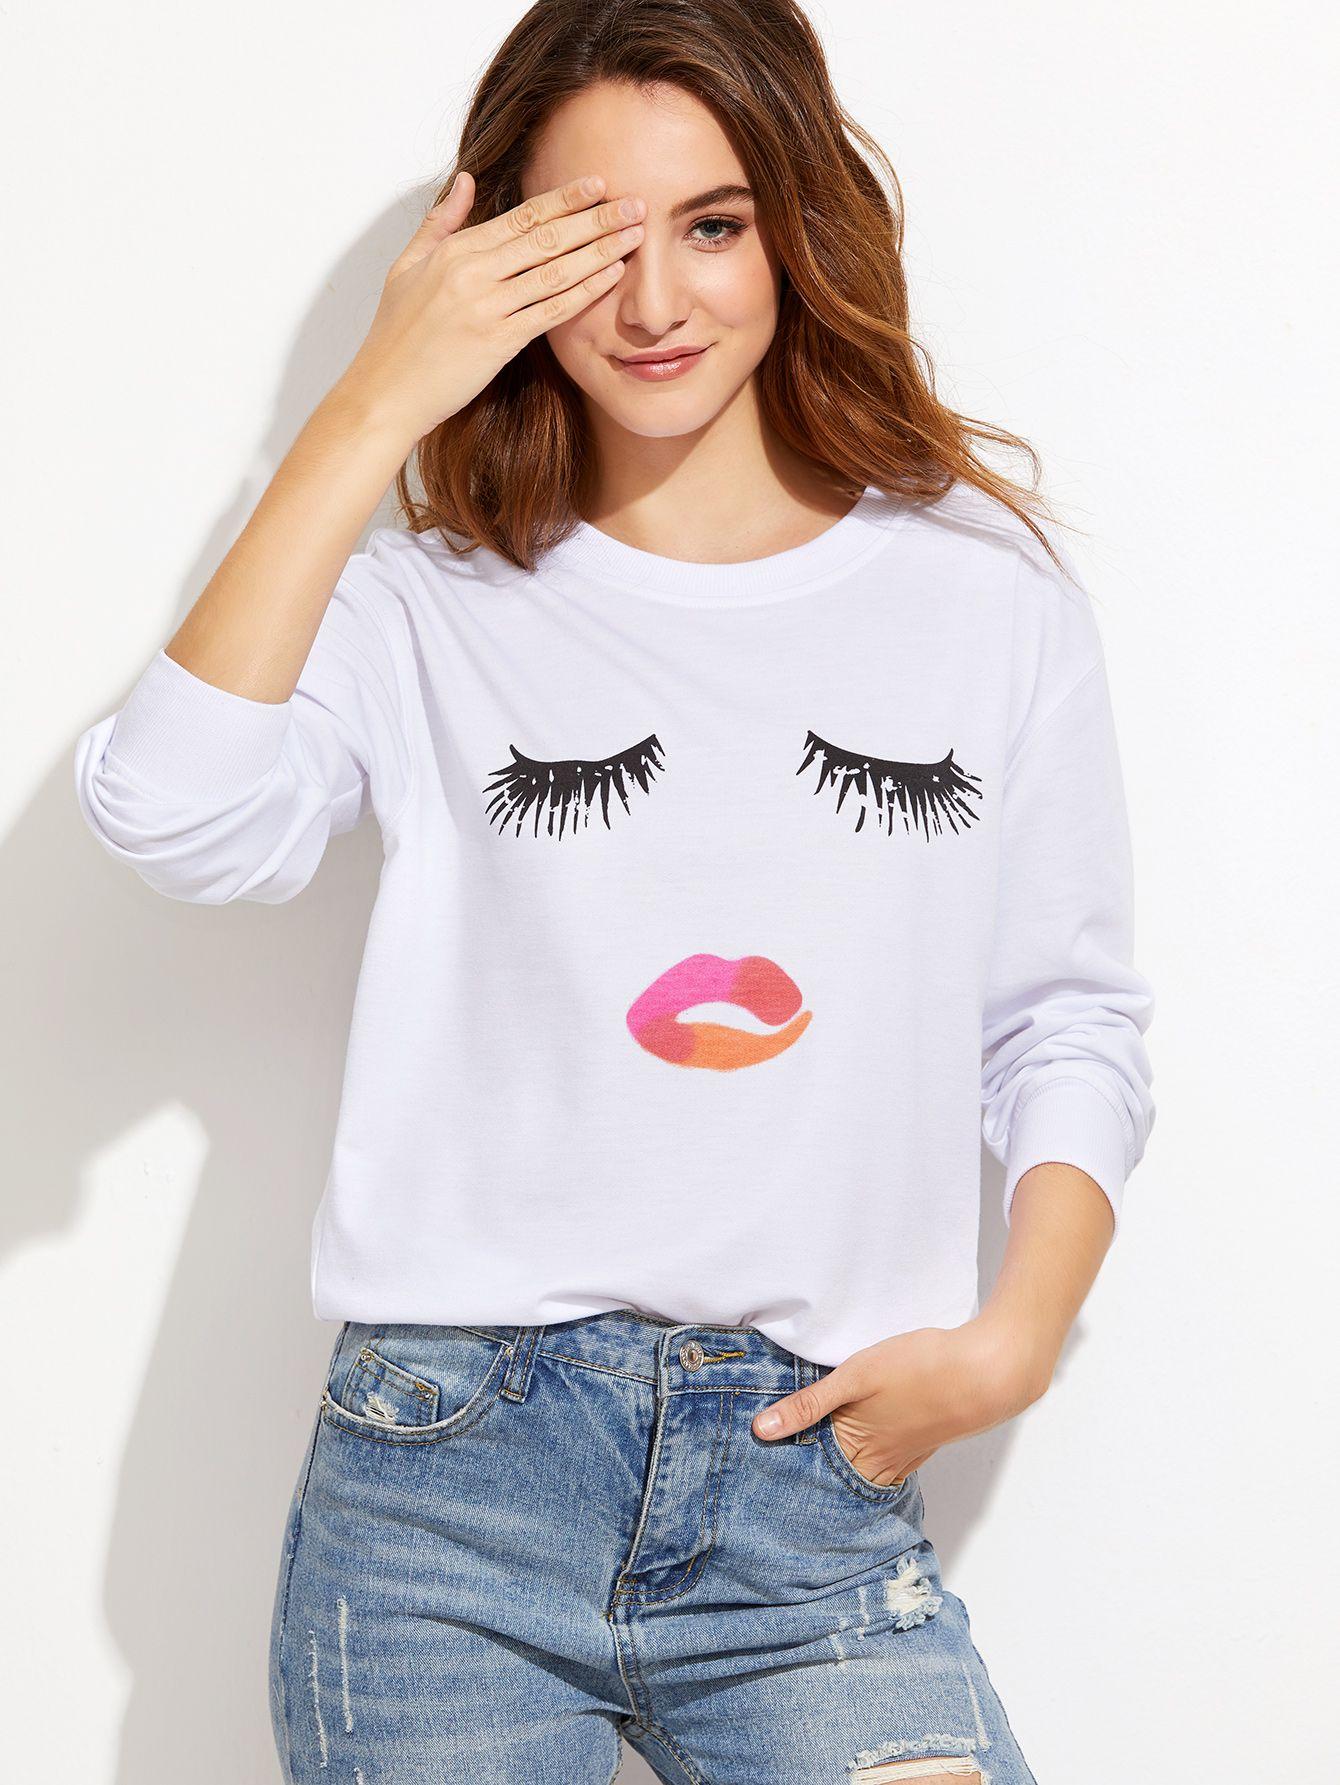 8b1759efd7 Shop White Closed Eyes Print Drop Shoulder Sweatshirt online. SheIn offers  White Closed Eyes Print Drop Shoulder Sweatshirt & more to fit your  fashionable ...